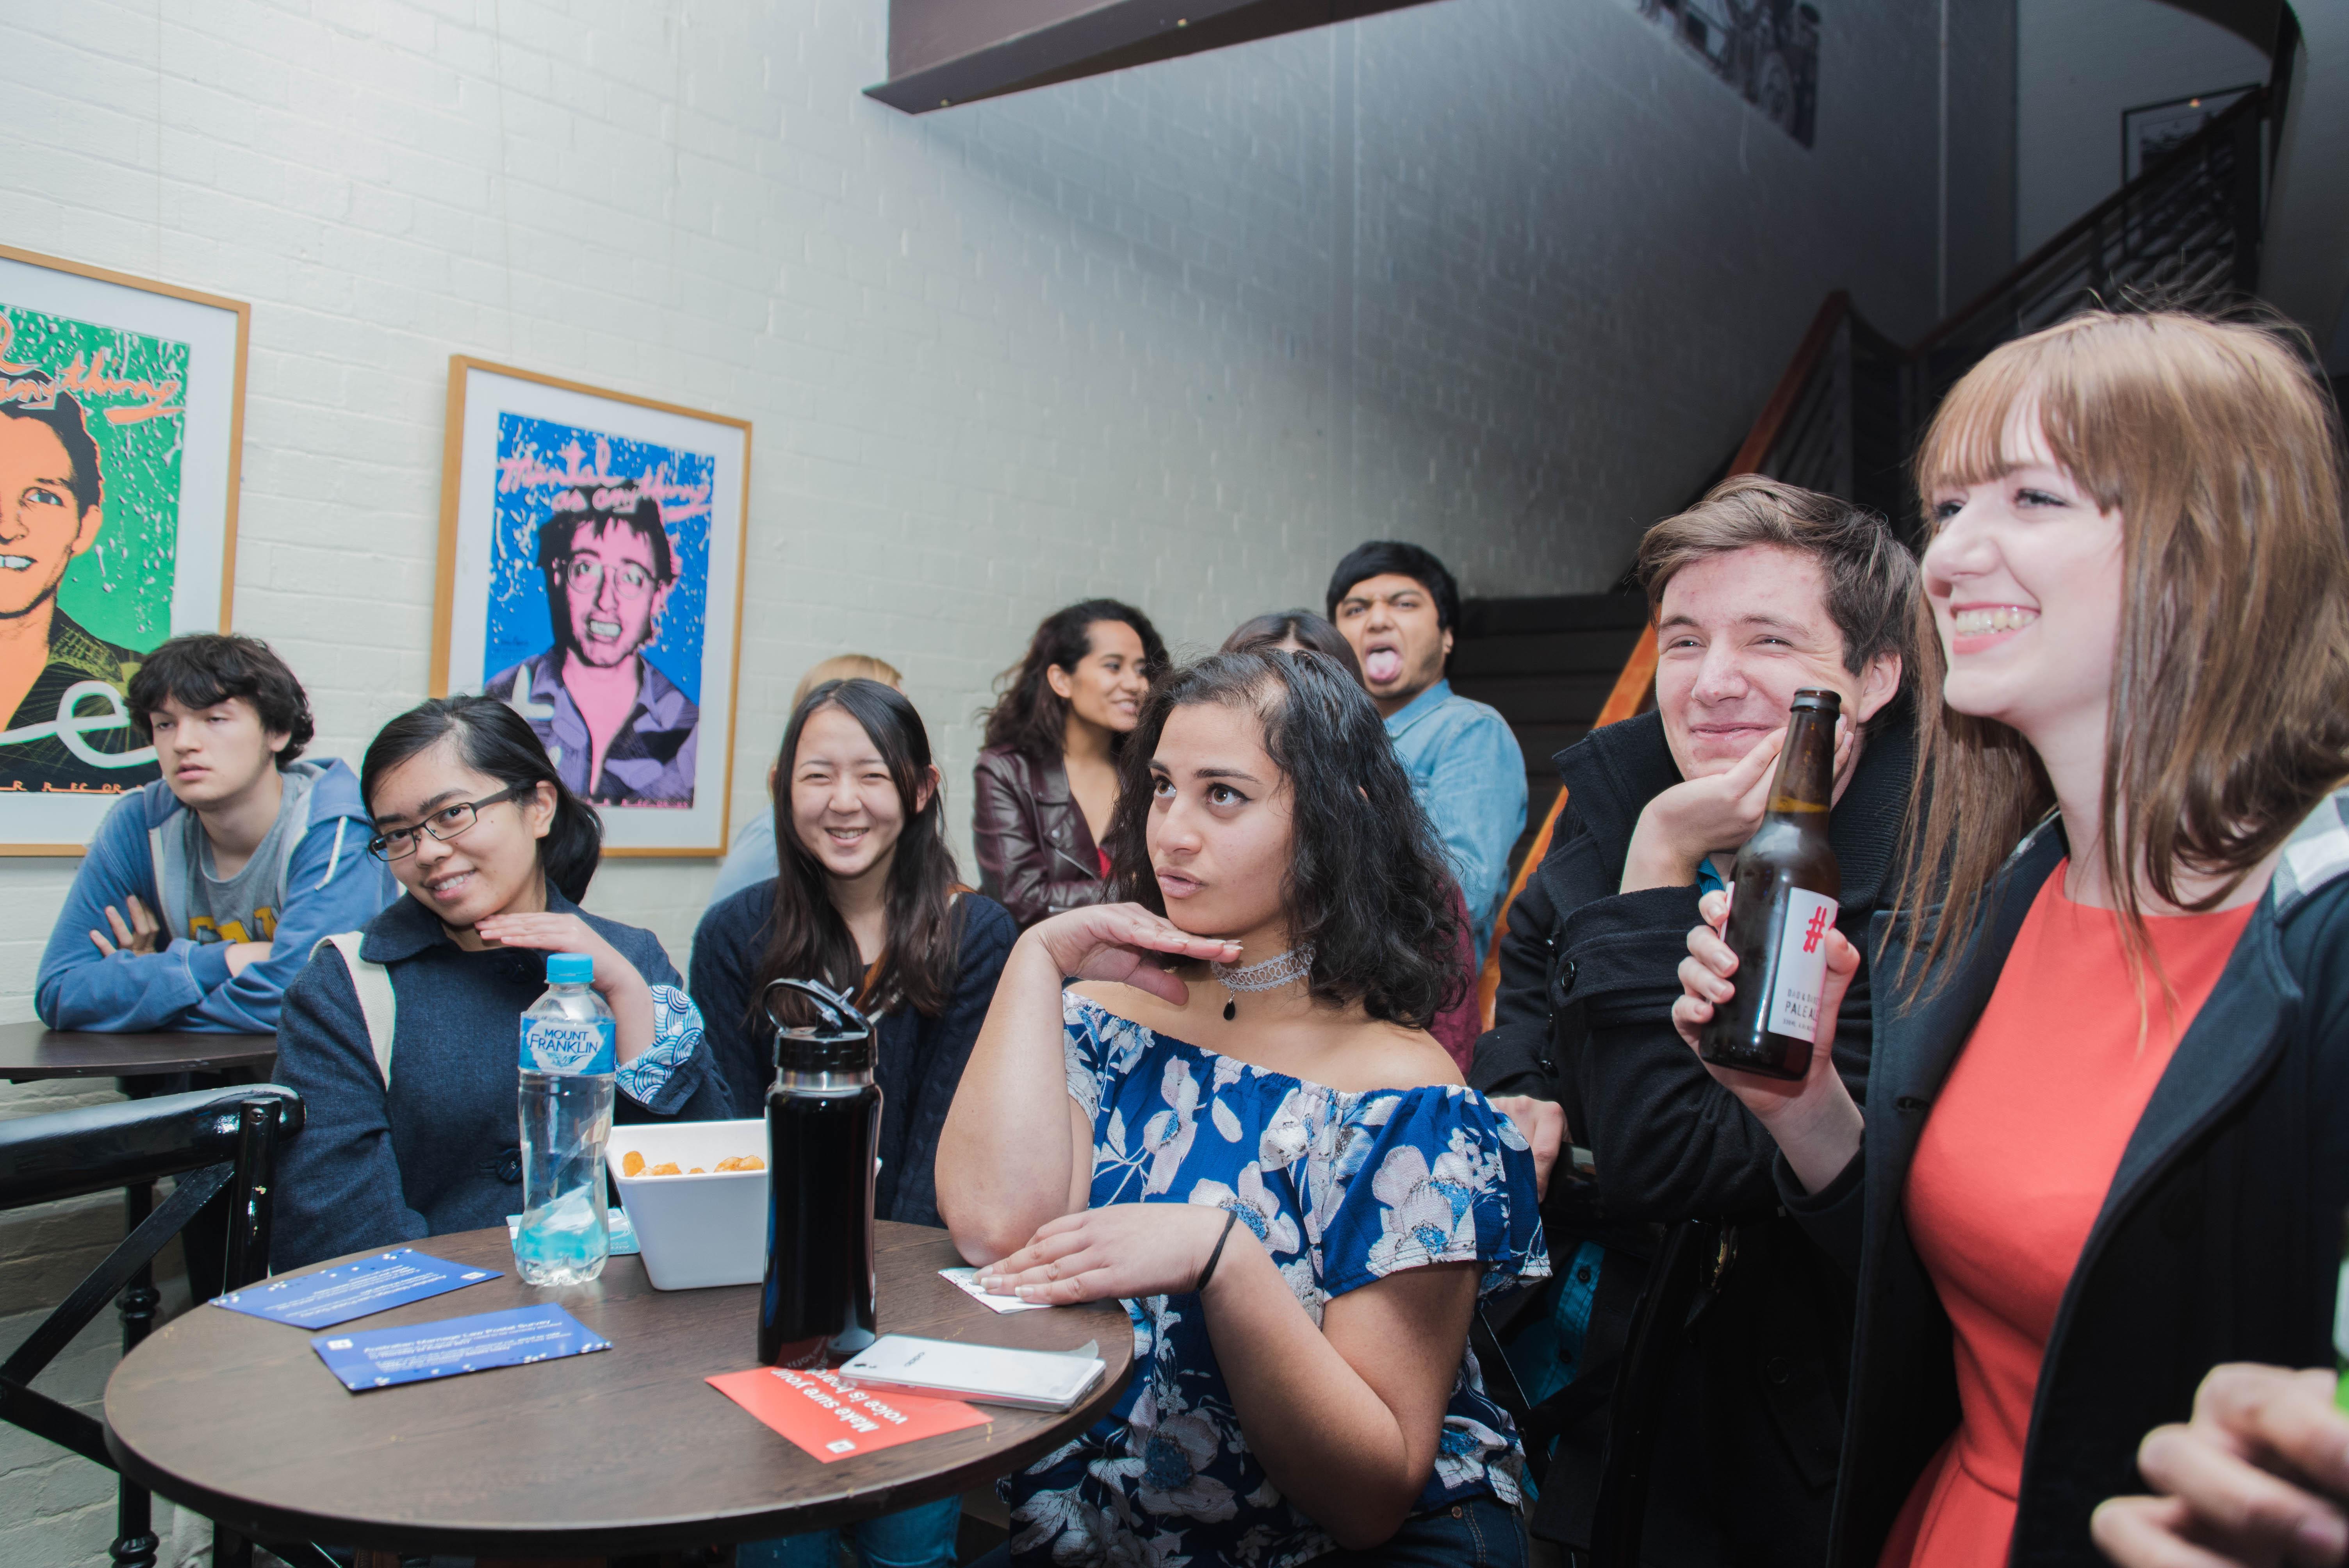 Diversity Week wrap party at The Loft